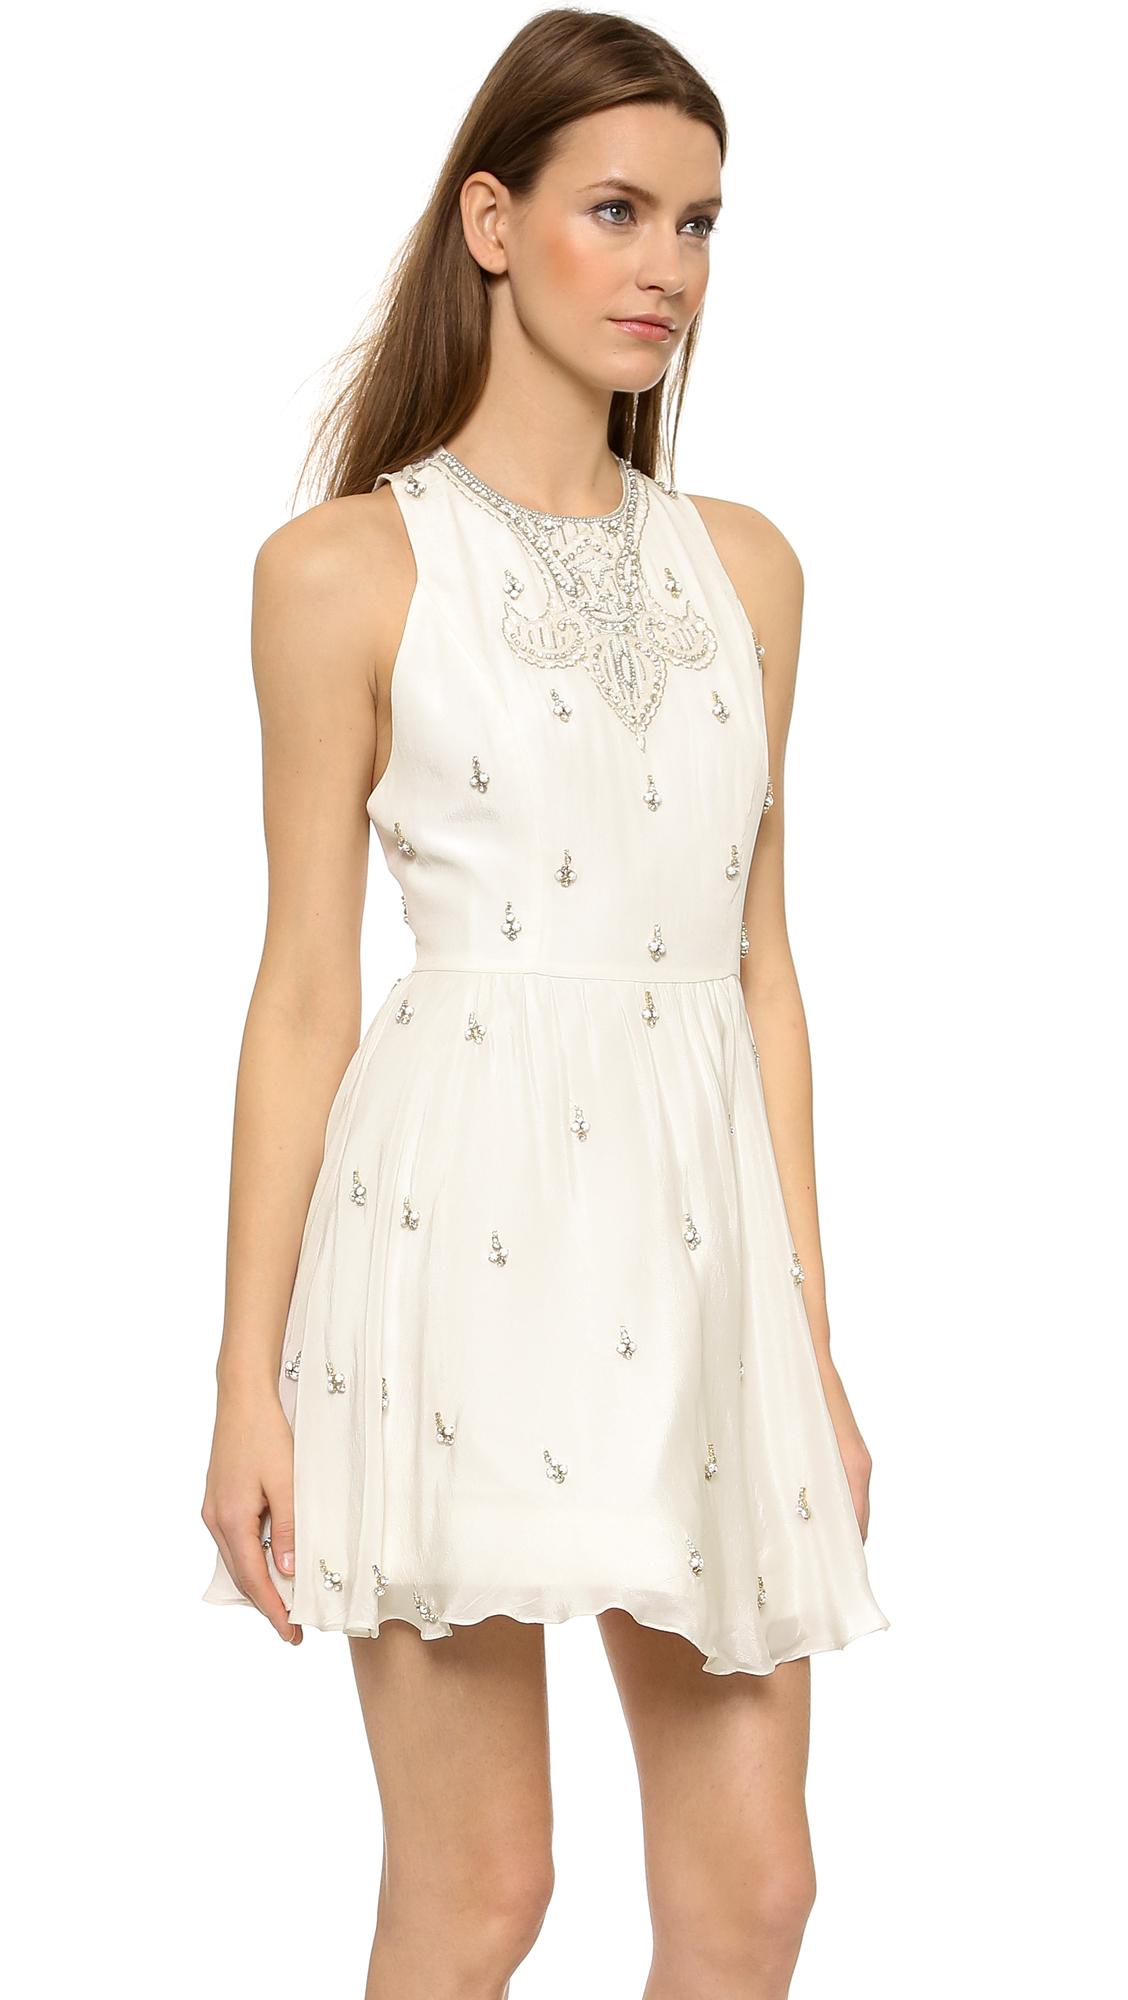 3088efce6f9 Alice + Olivia Gilda Embellished Lace Back Dress - Off White in ...